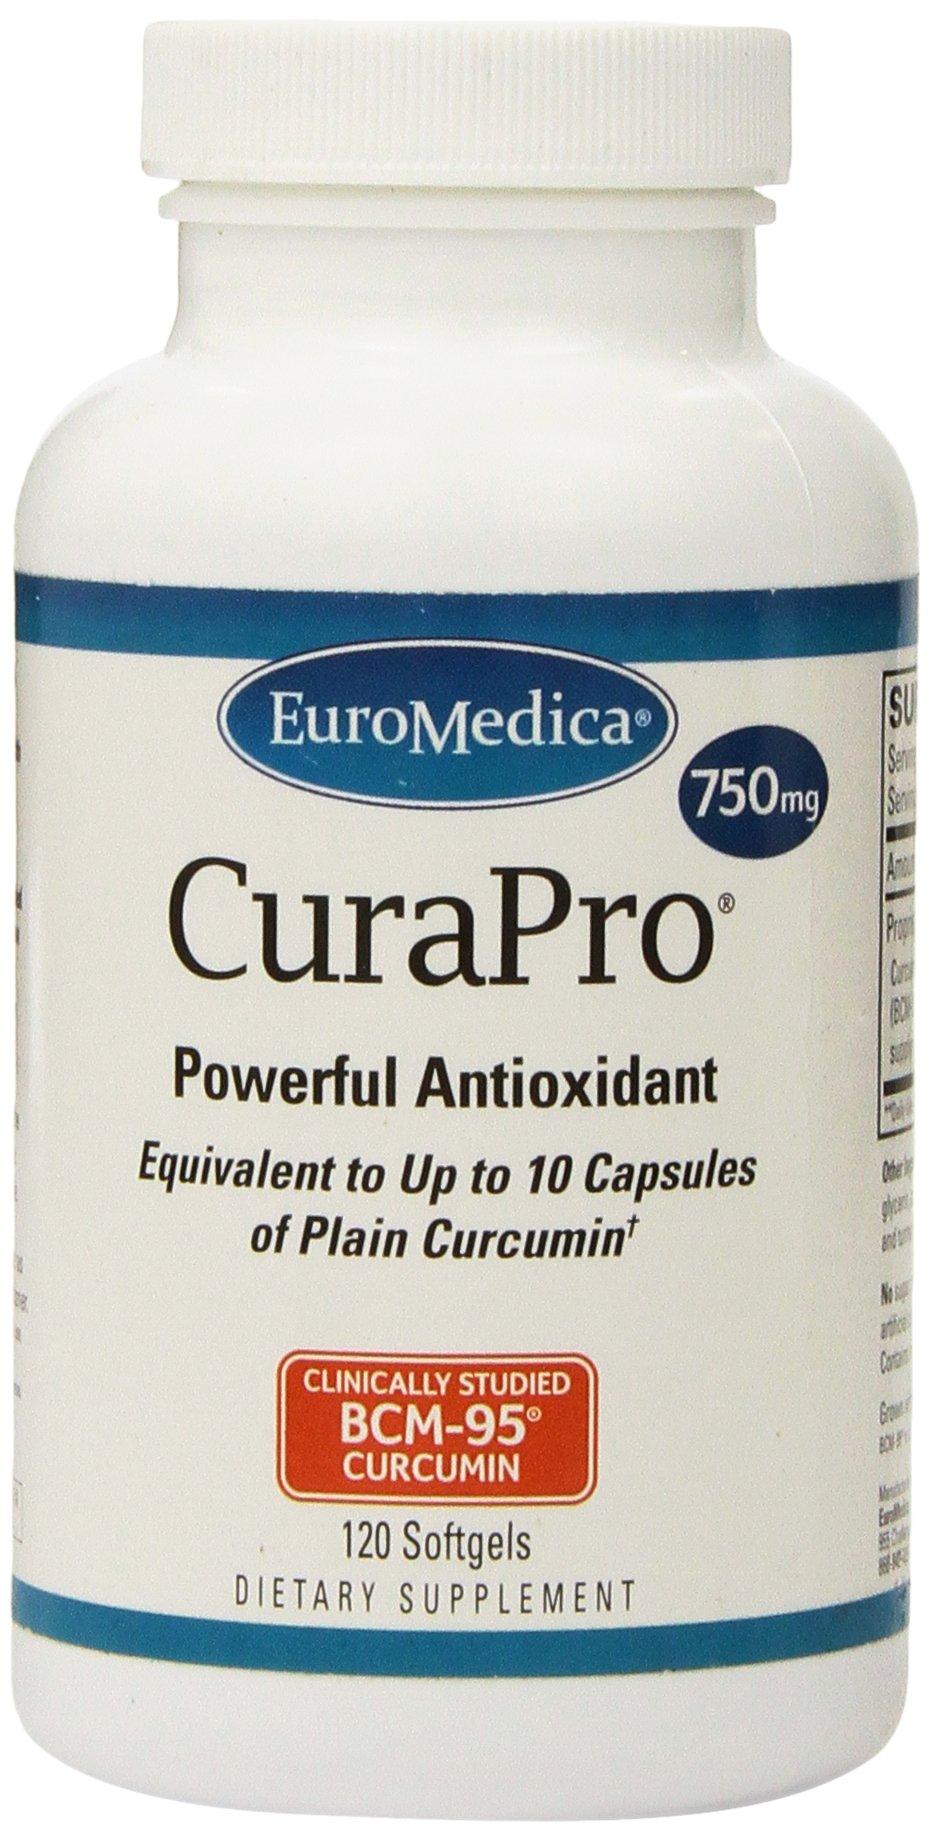 EuroMedica - CuraPro 750 mg 120 softgels [Health and Beauty]